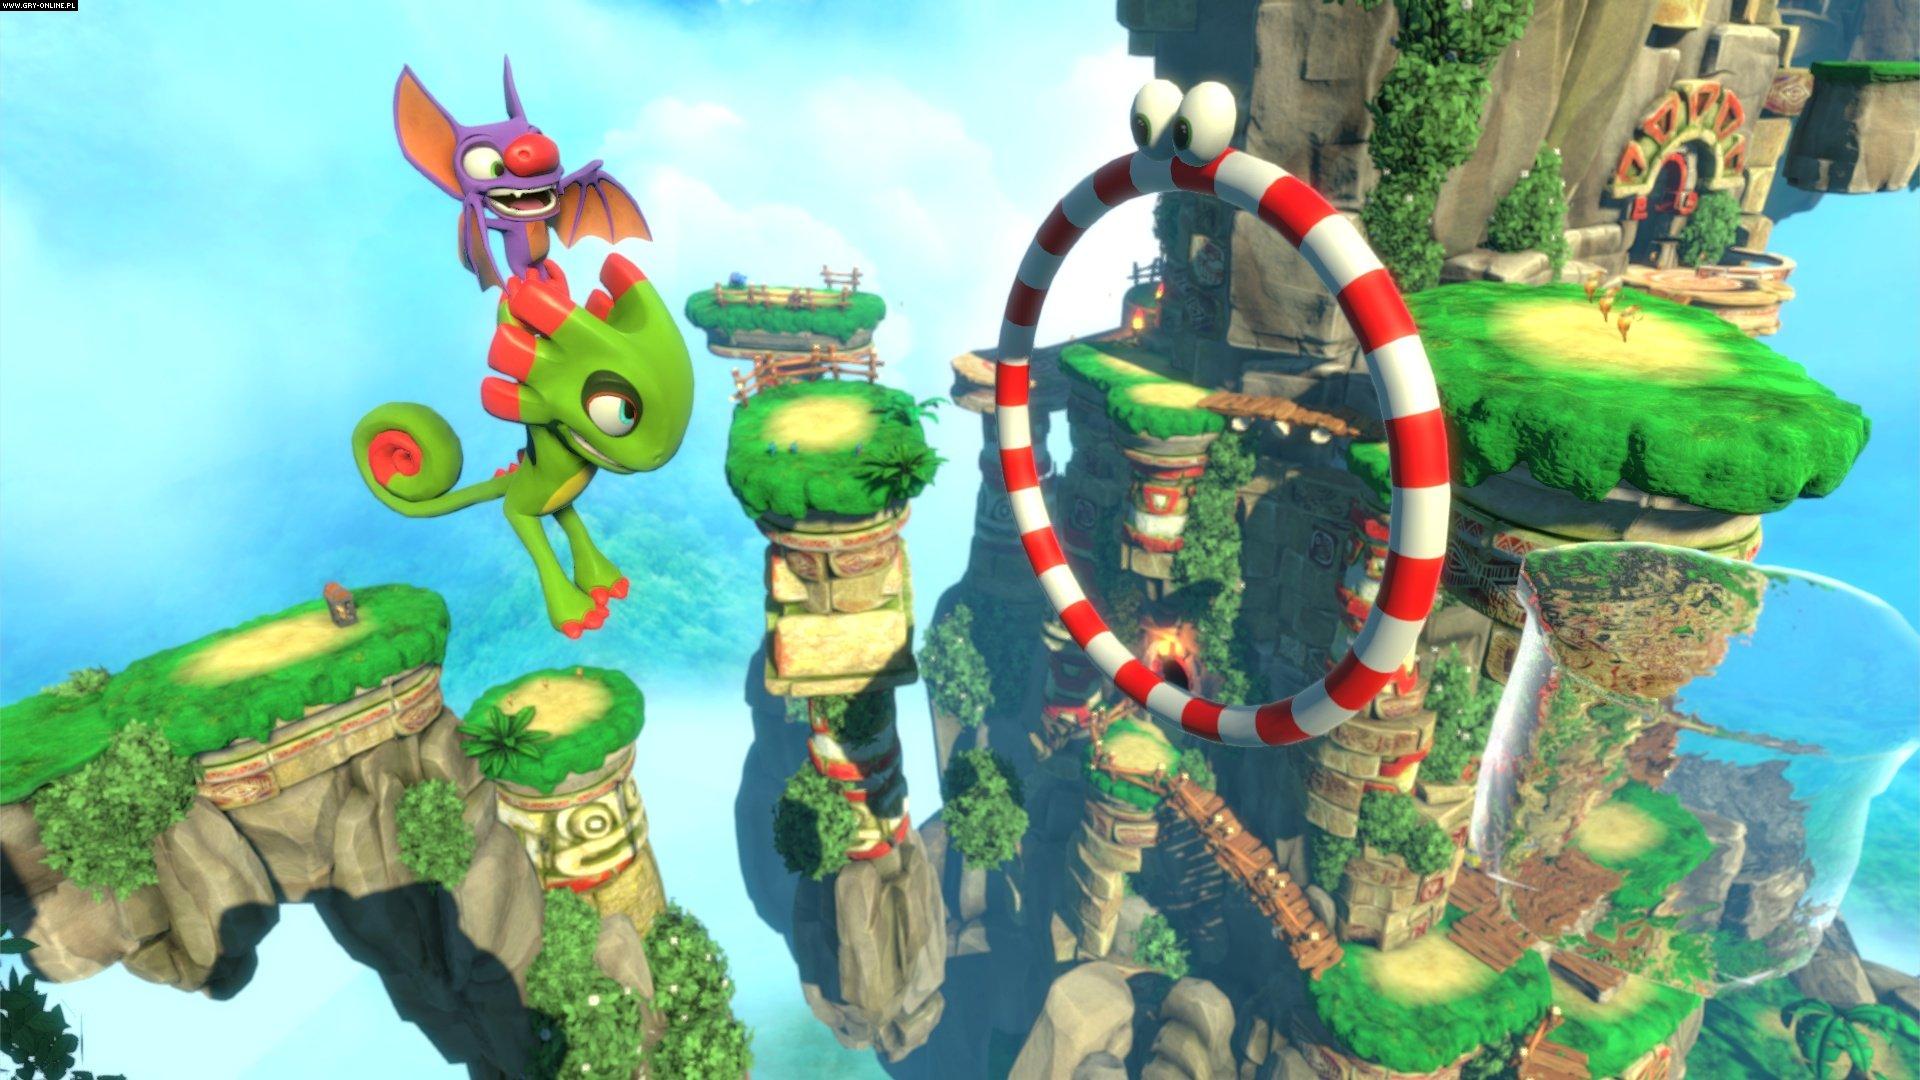 Yooka-Laylee PC, WiiU, XONE, PS4 Games Image 19/30, Playtonic Games, Team 17